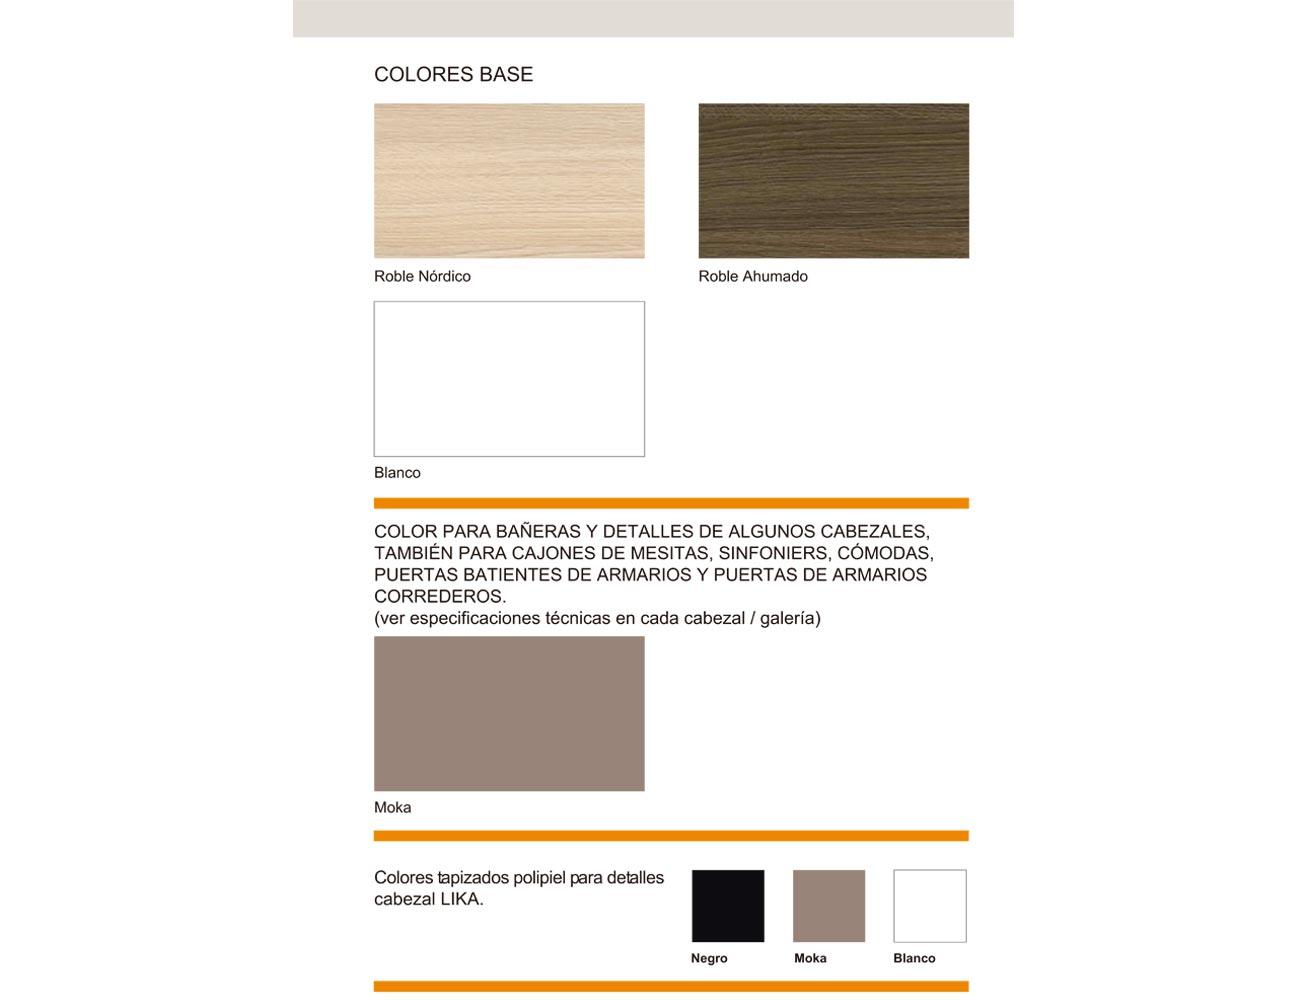 Colores245